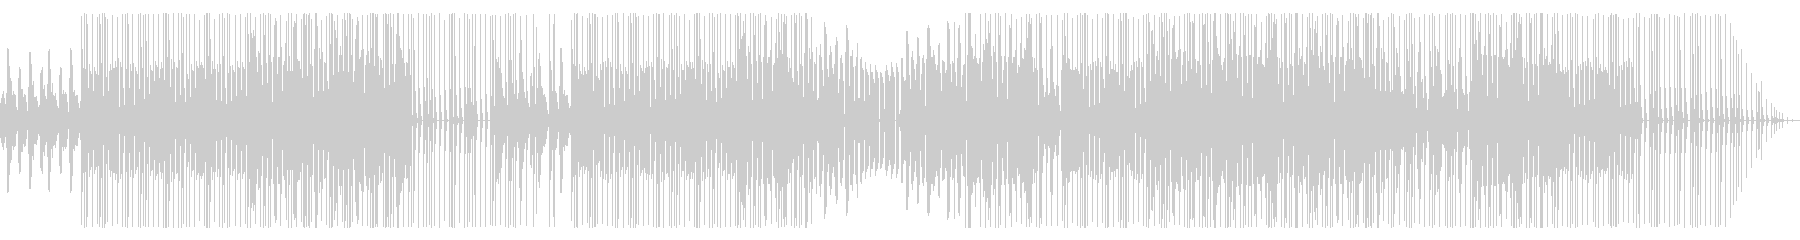 Mumble rapっぽいBGMの未再生の波形